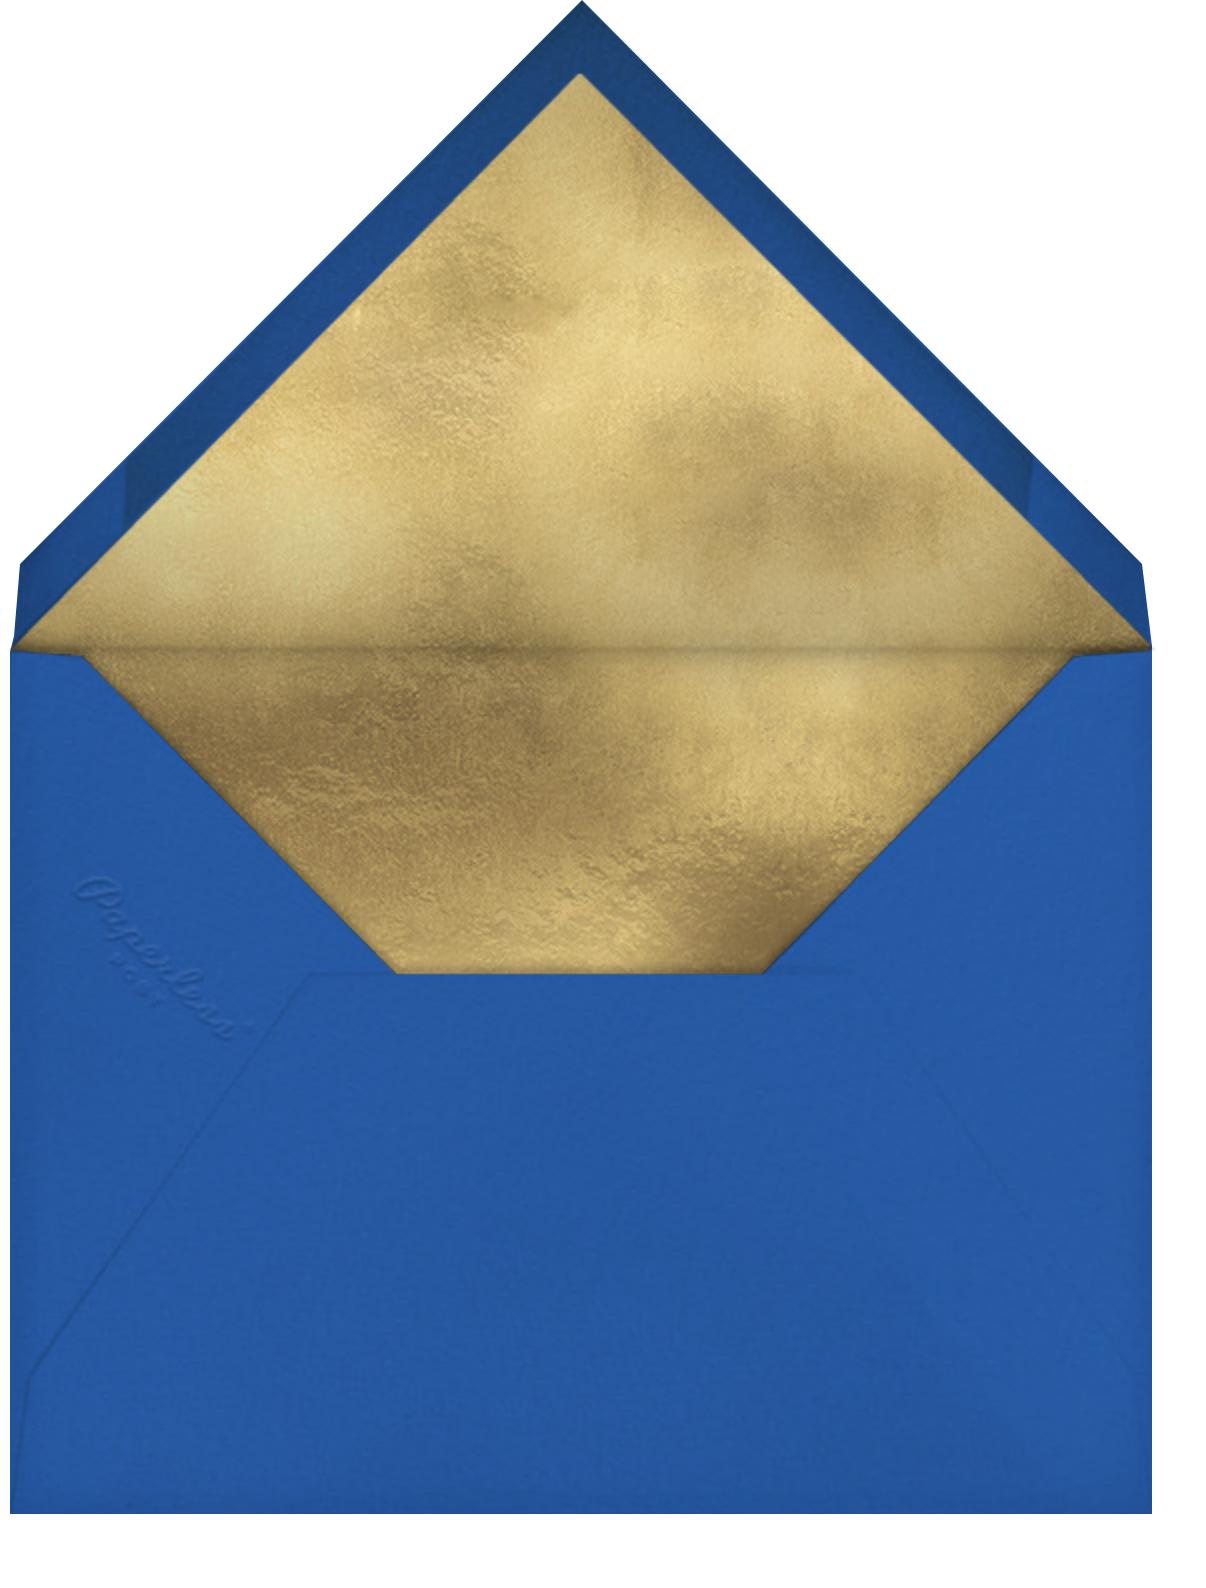 Laguna - Jonathan Adler - Virtual parties - envelope back